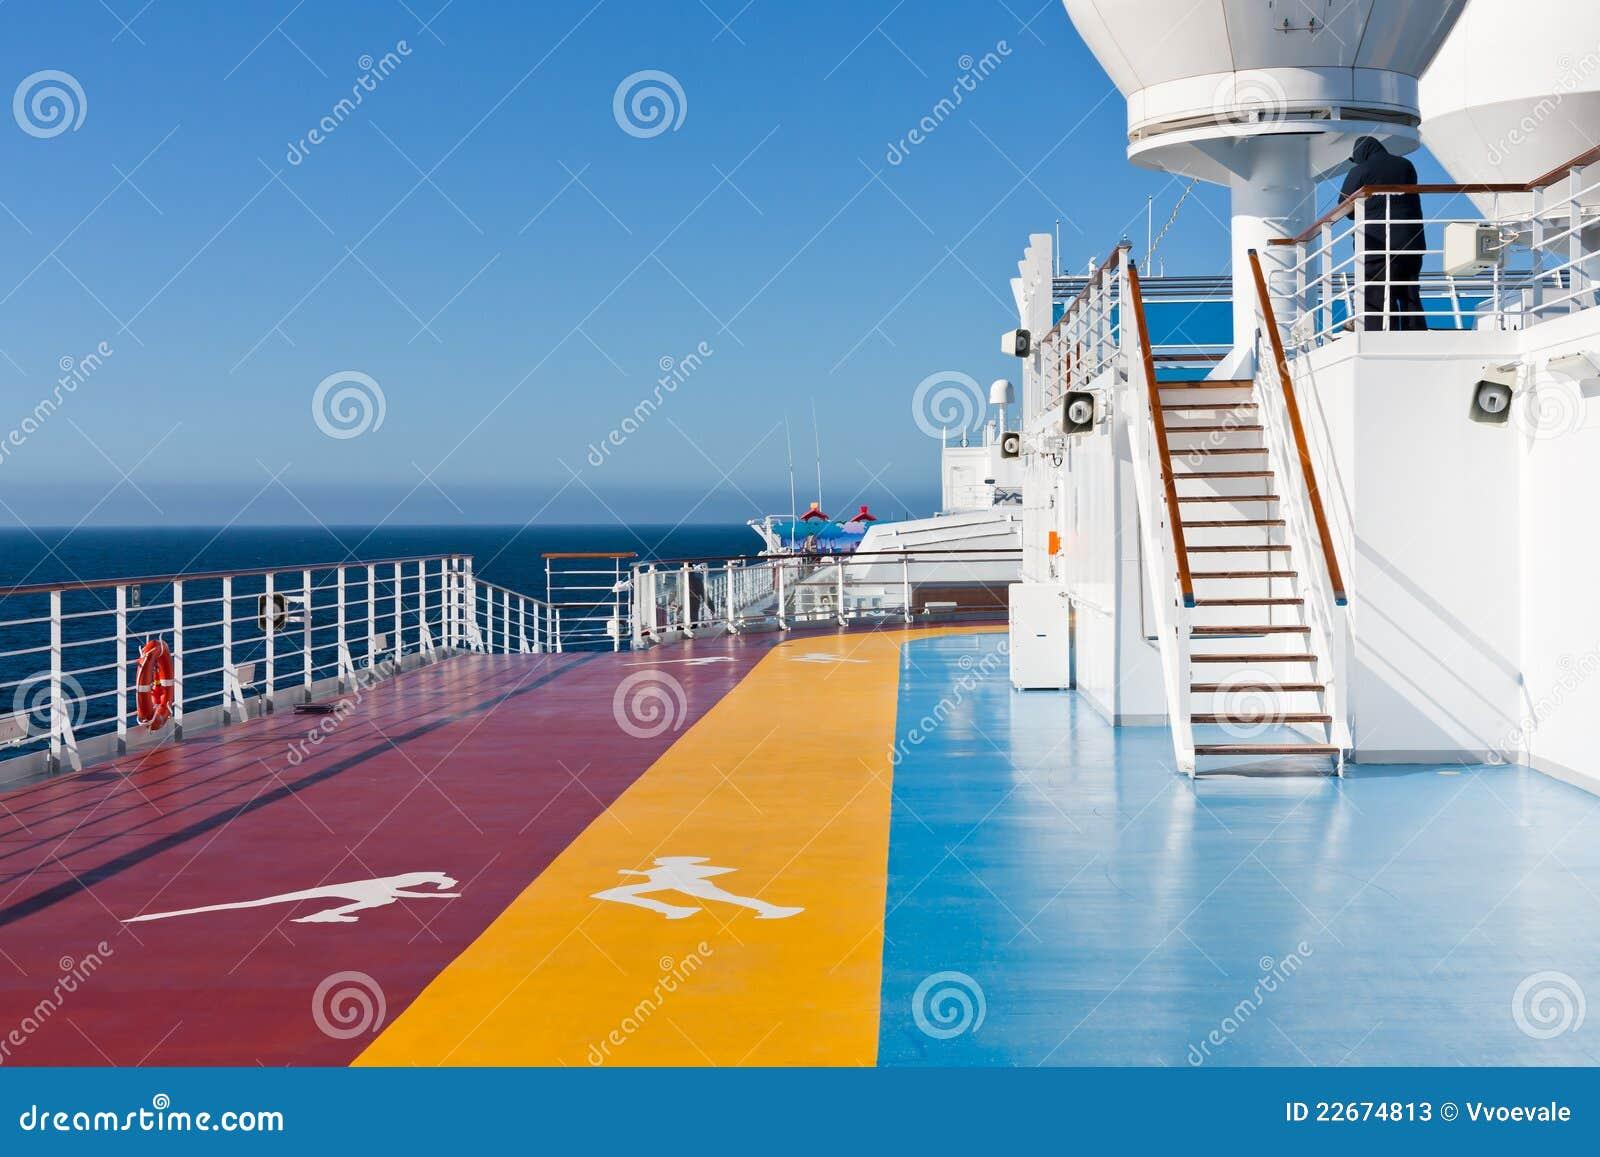 Photo : Msc Musica Deck Plan Images. Floor Plan Student ...